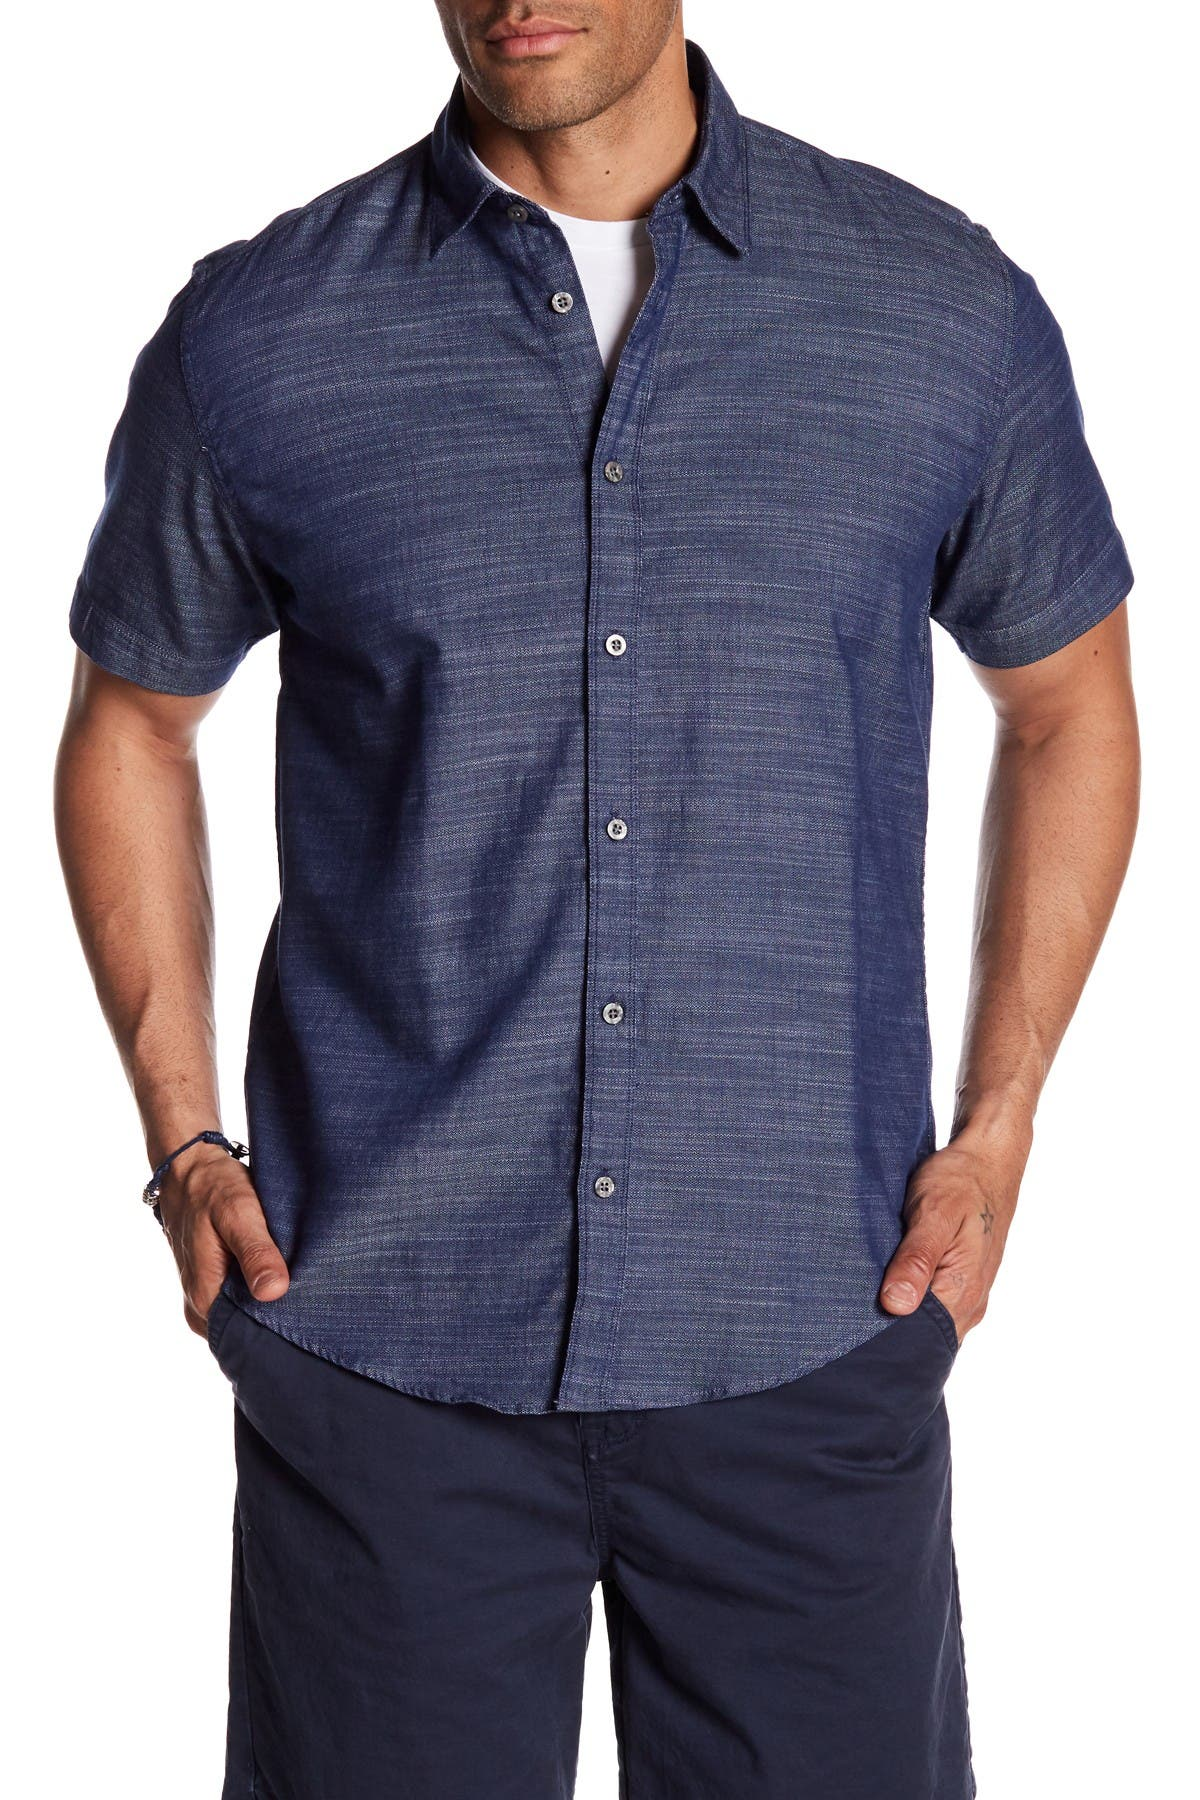 Image of COASTAORO Tides Micro Zigzag Slim Fit Shirt